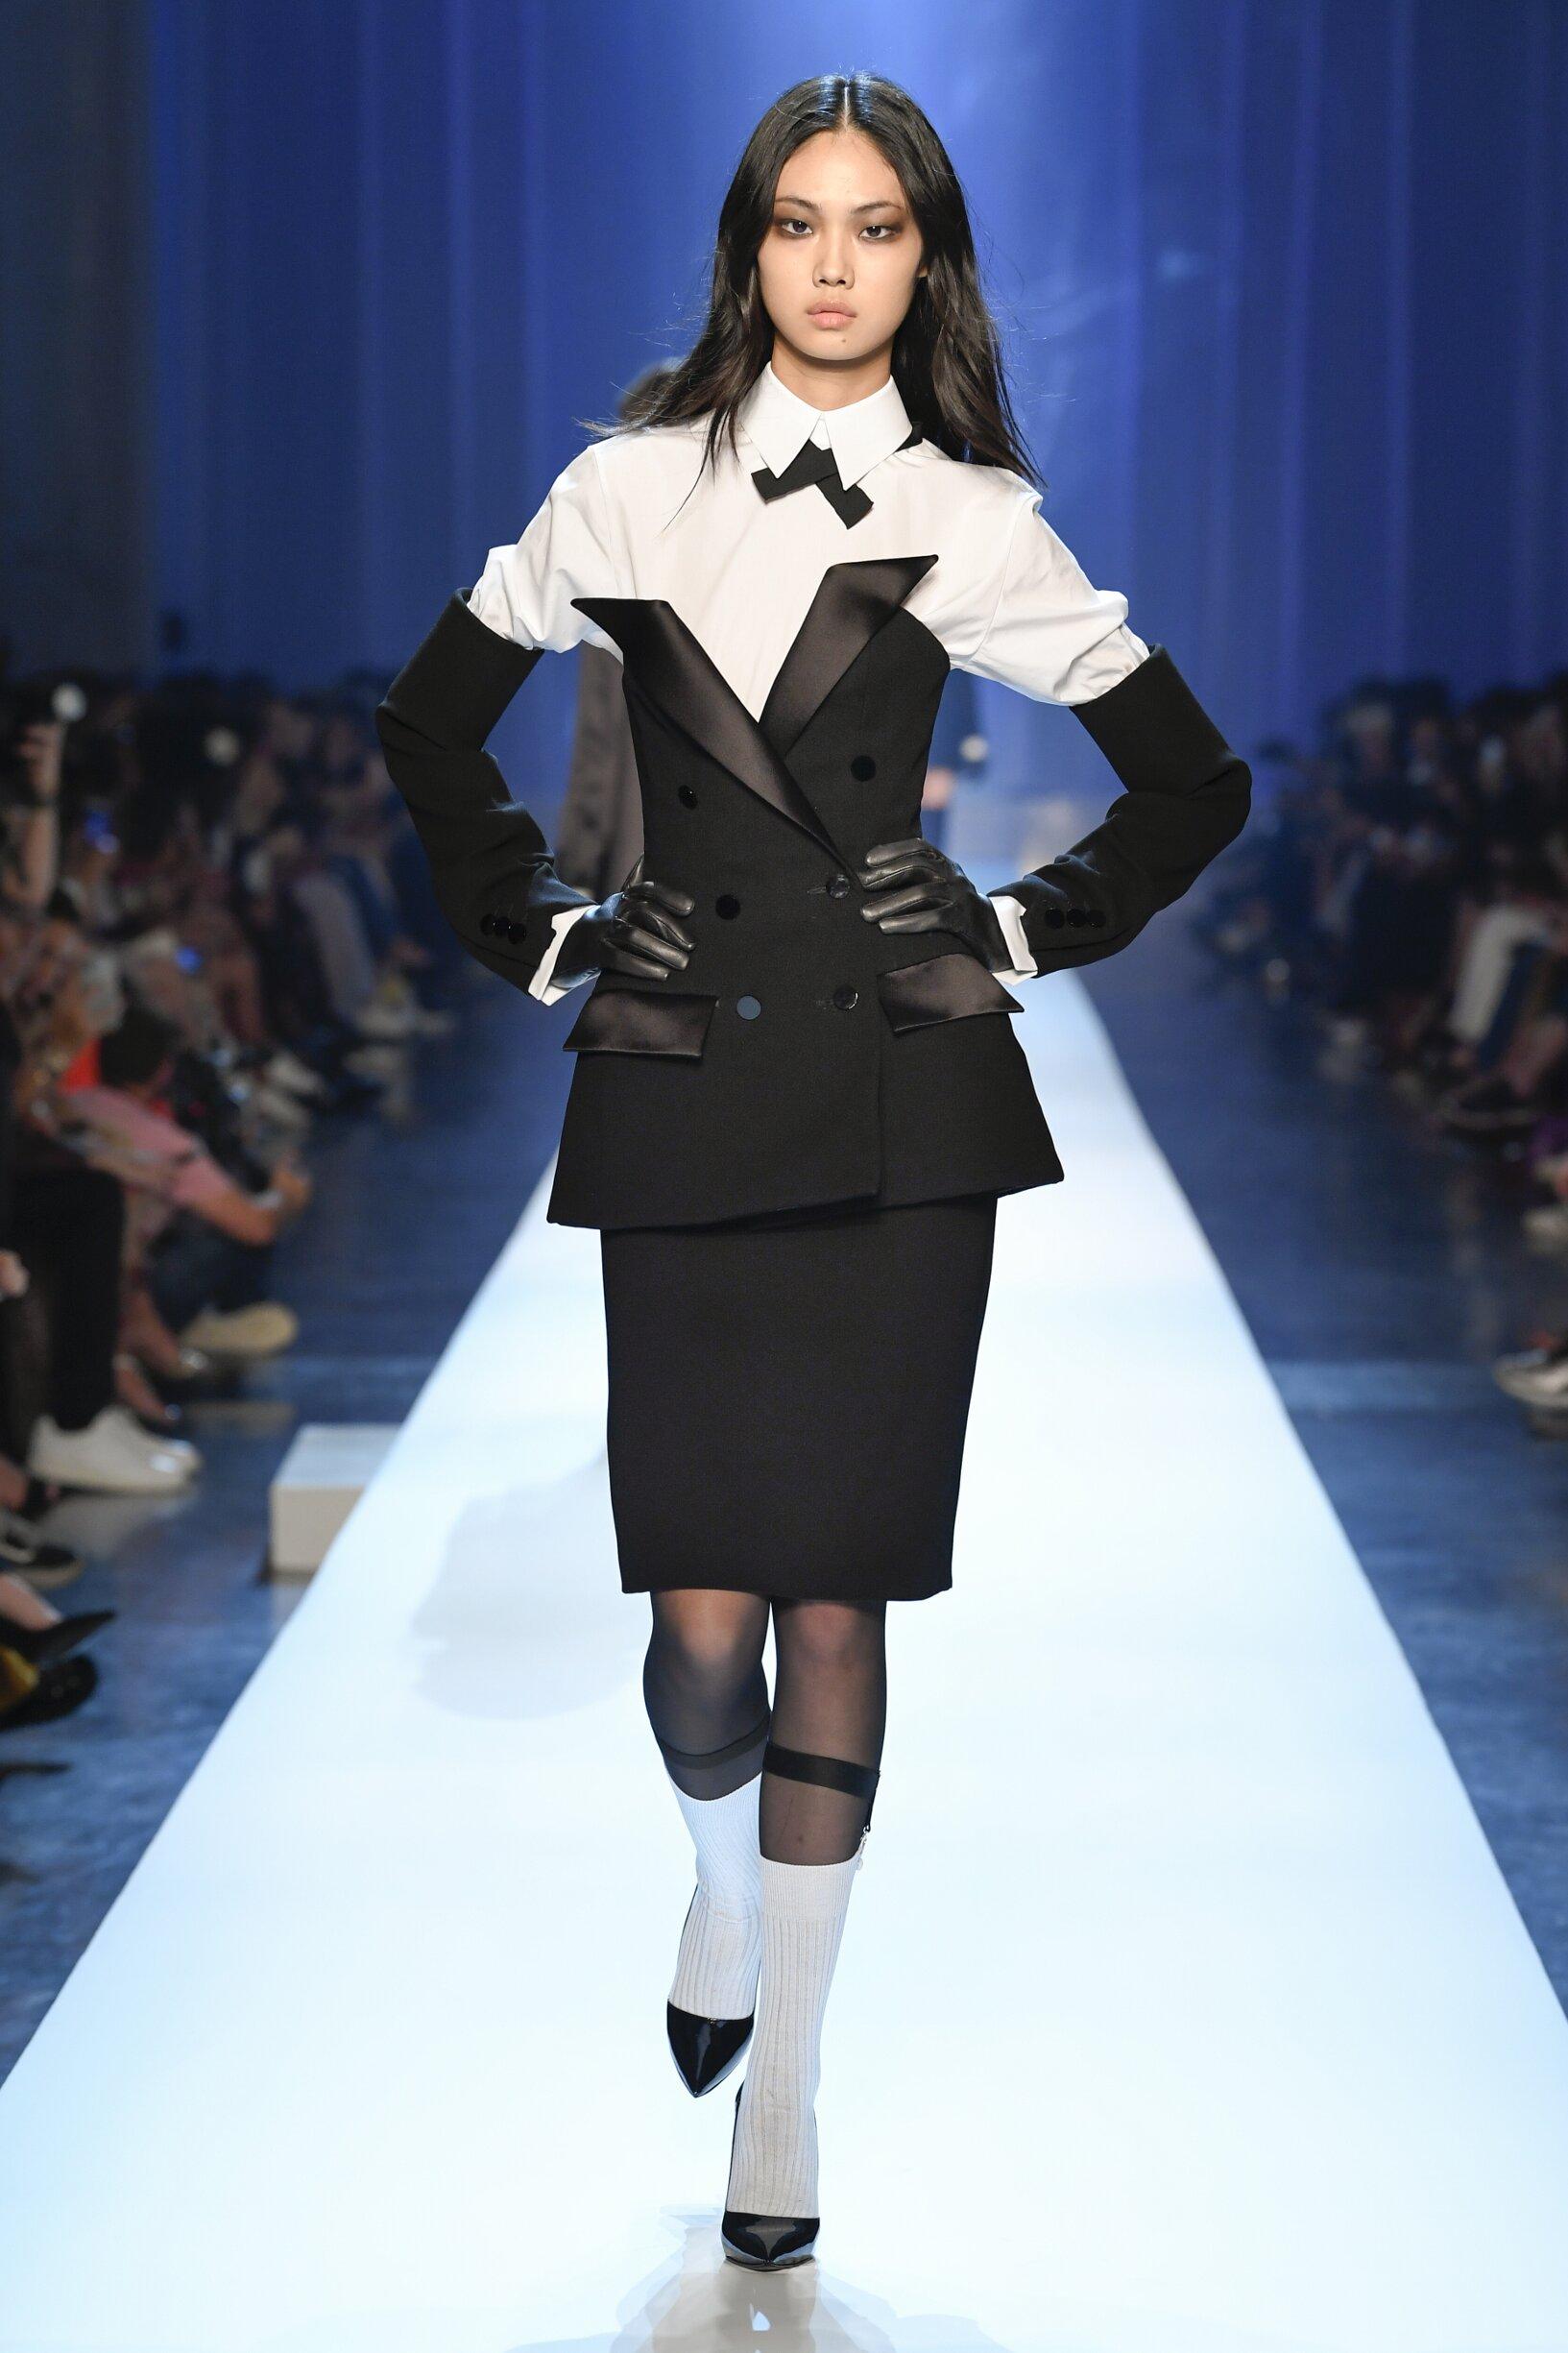 Woman FW 2018 Jean-Paul Gaultier Haute Couture